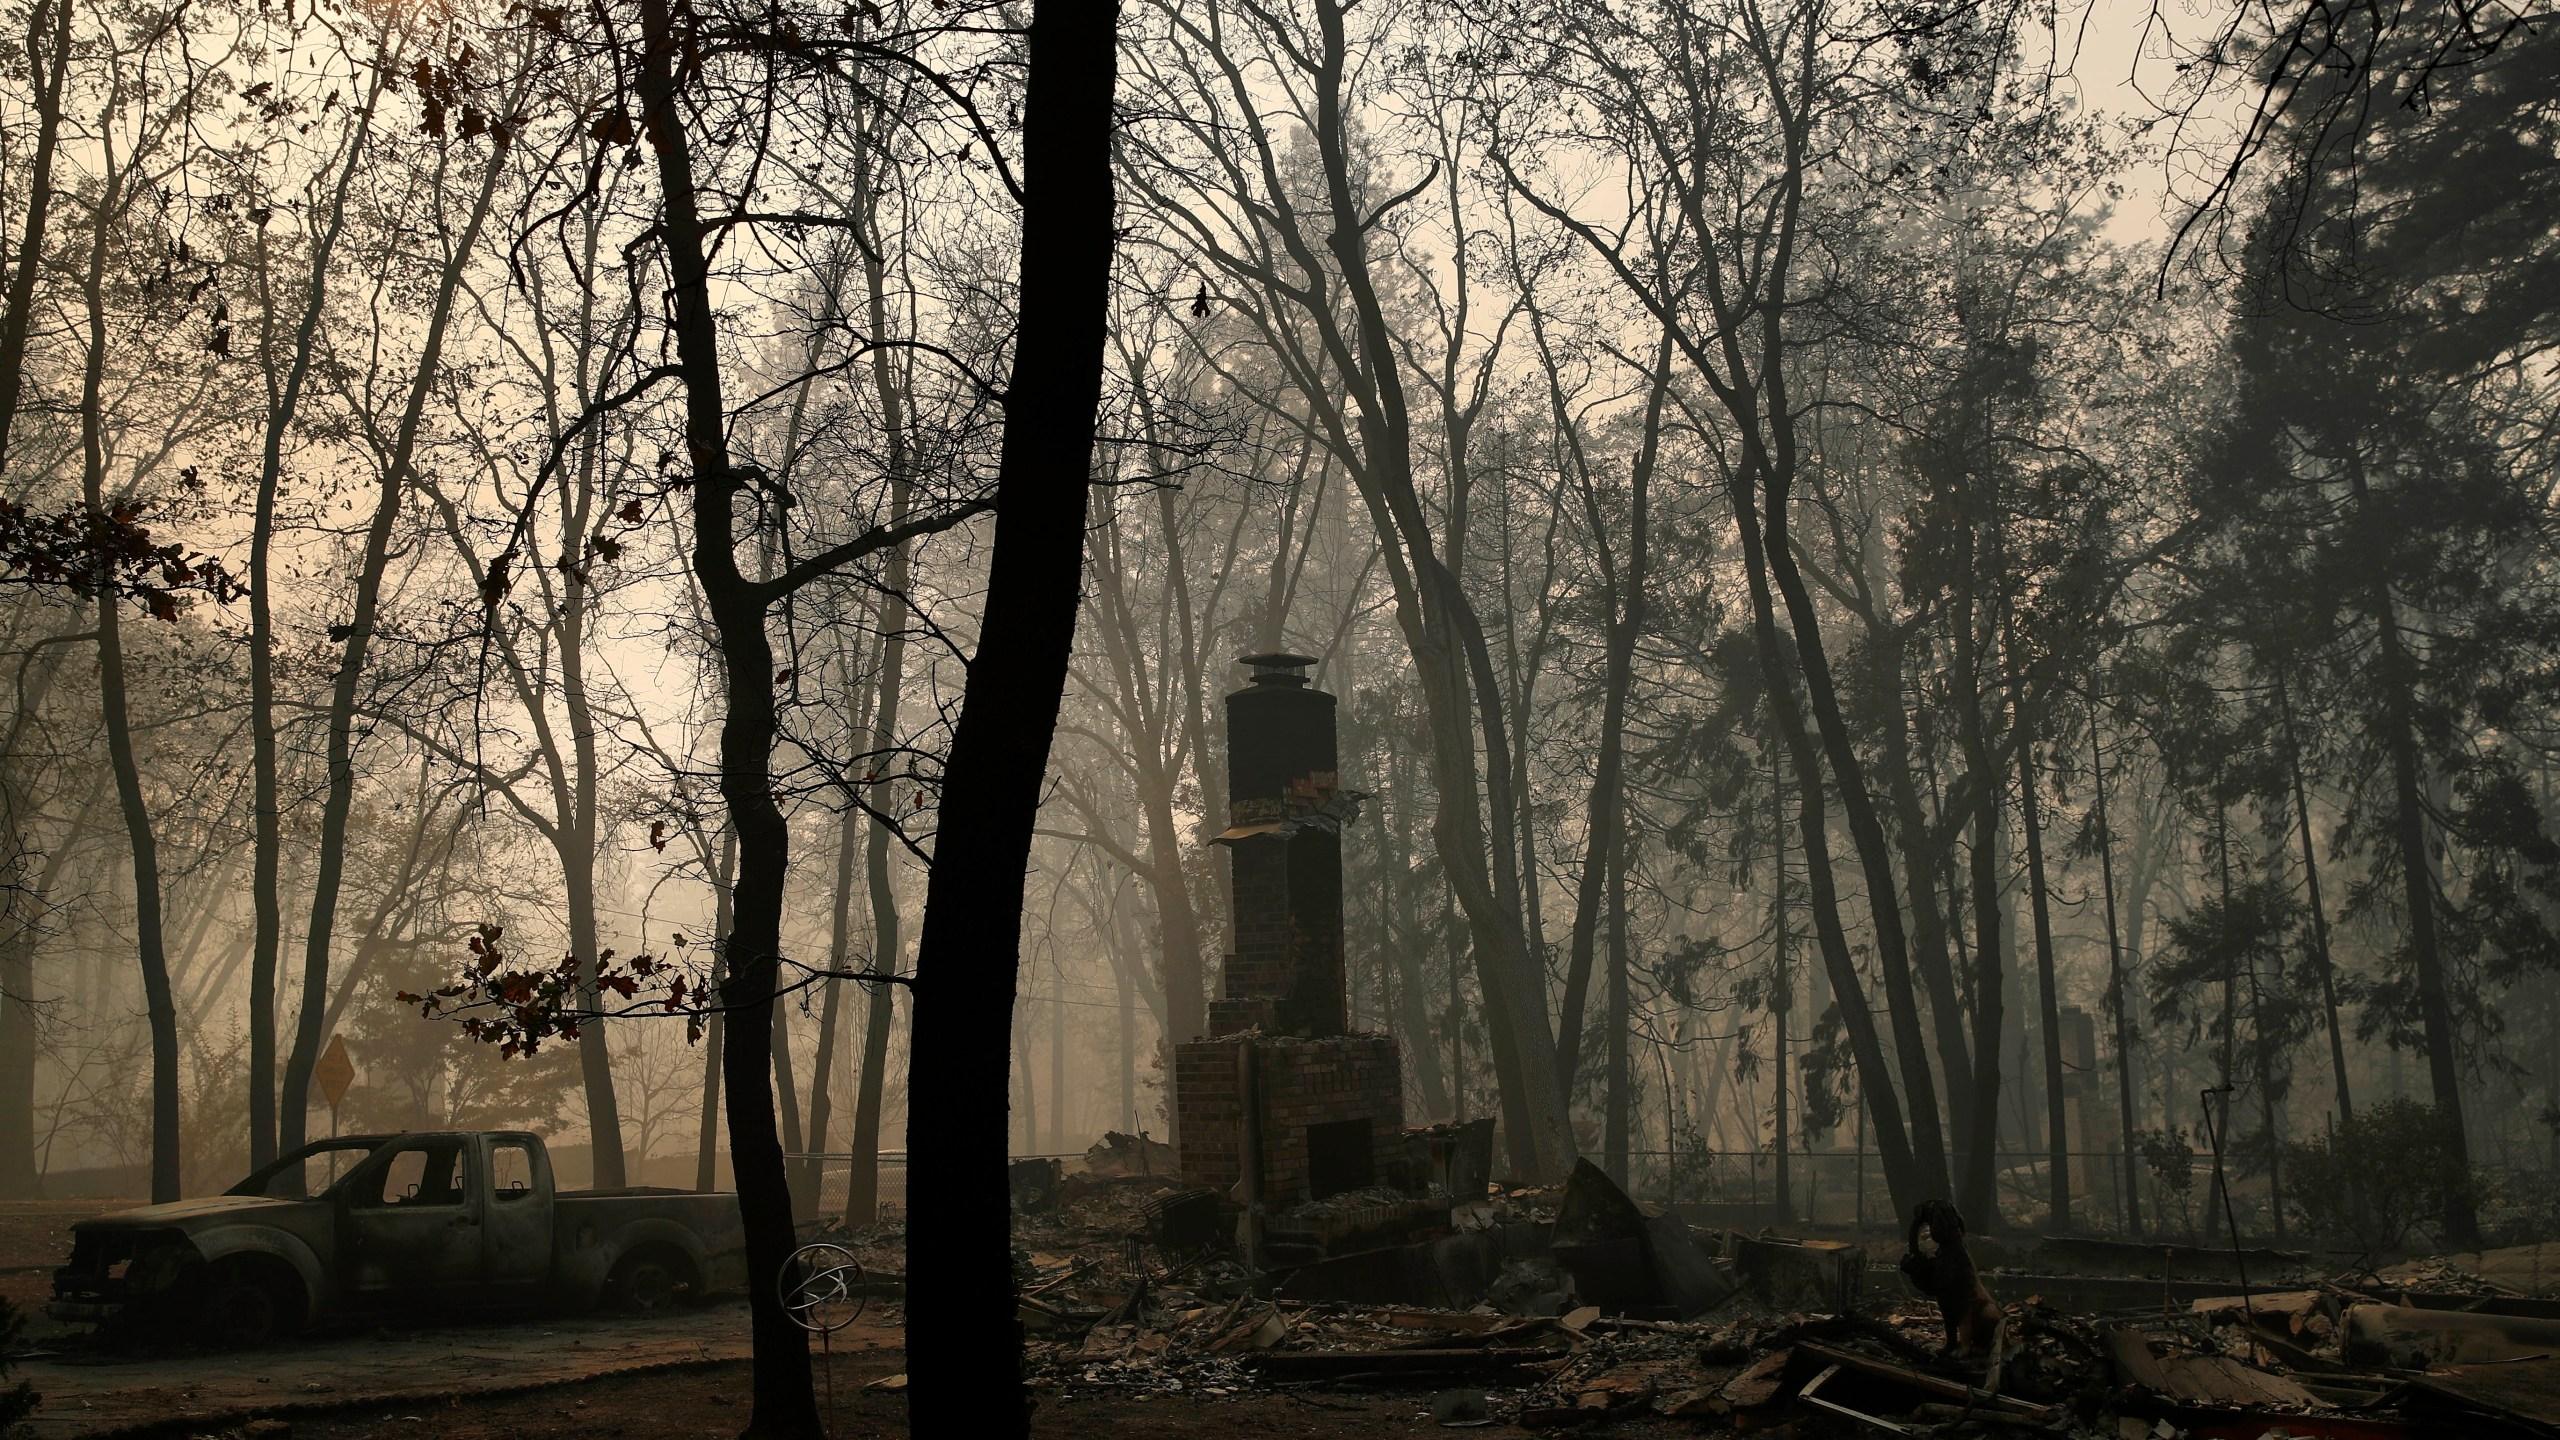 California_Wildfires_82374-159532.jpg36748858